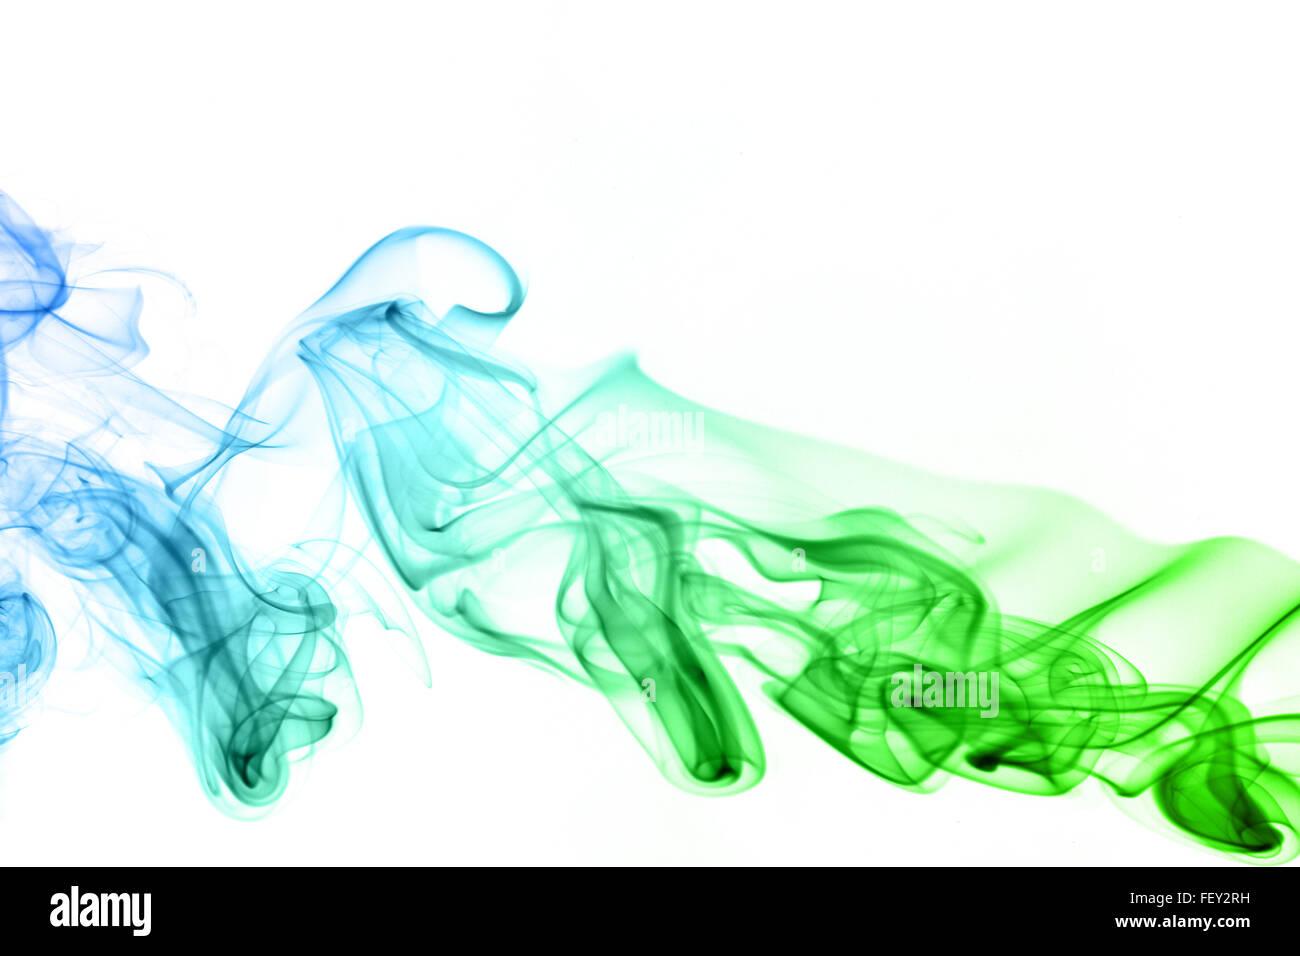 Colored smoke isolated on white background - Stock Image